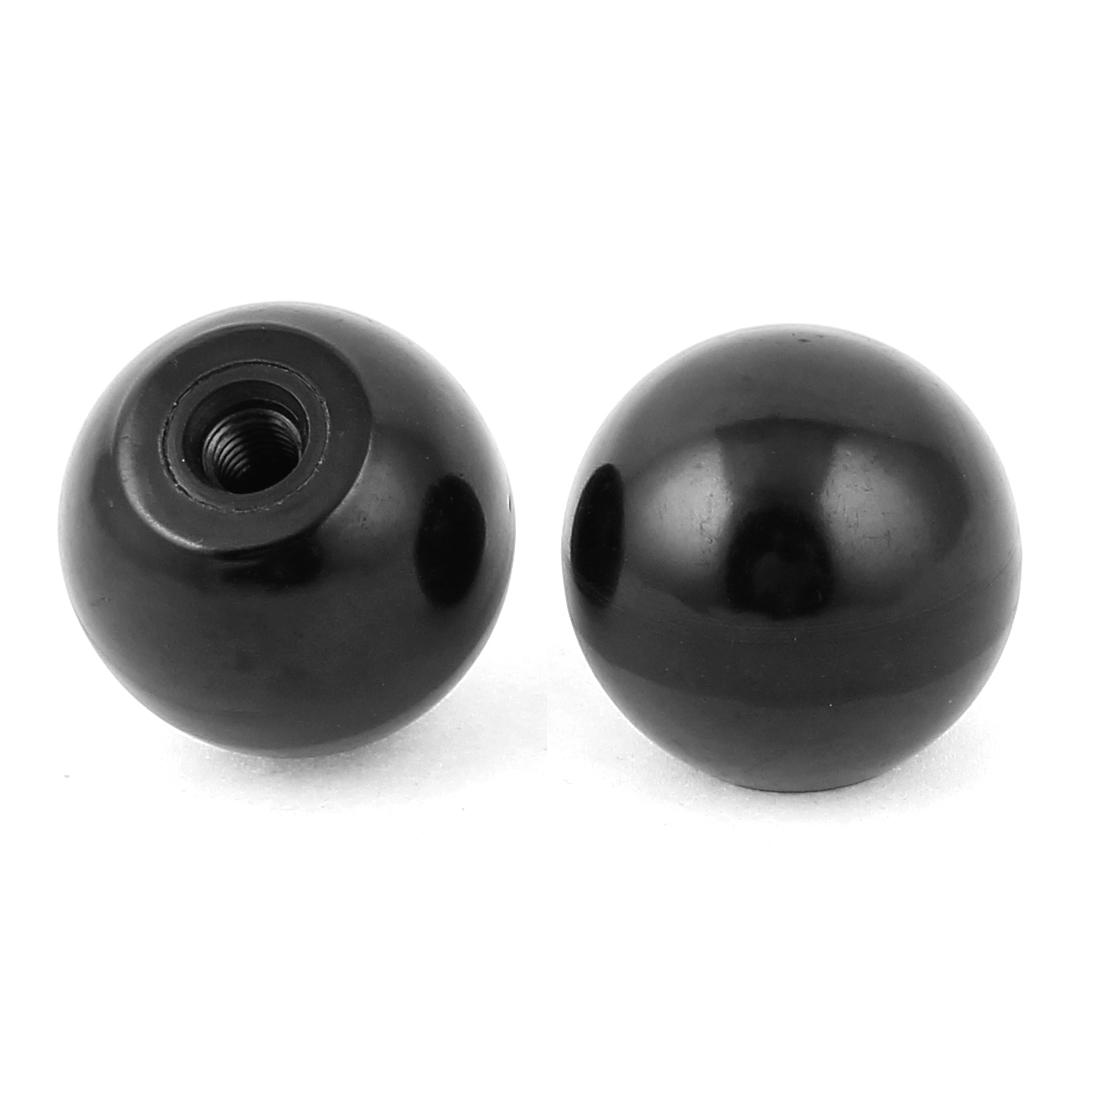 2 Pcs Round M8 Threaded Blind Hole 40mm Dia Ball Knob Handle Black